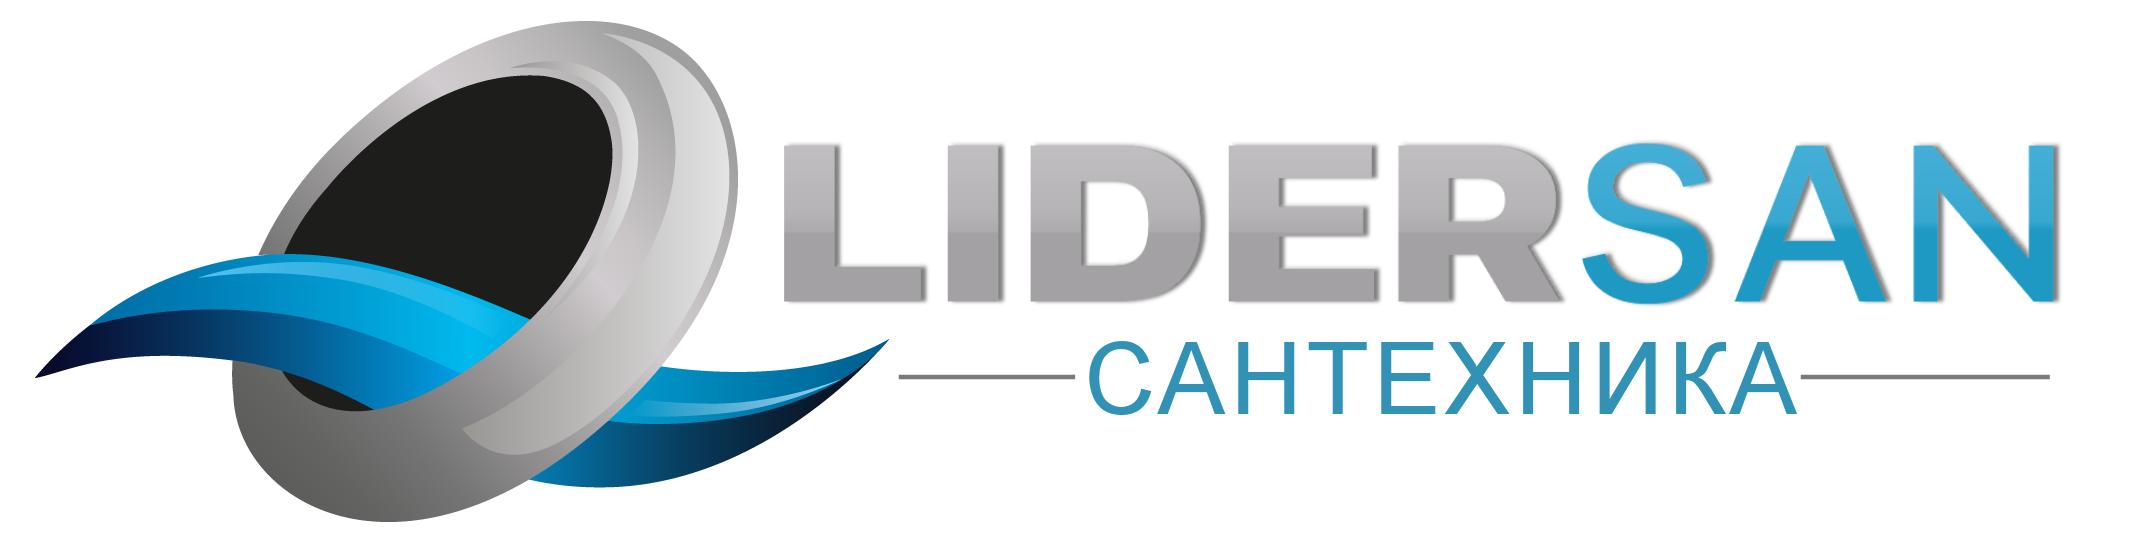 Интернет-магазин сантехники Lider-San